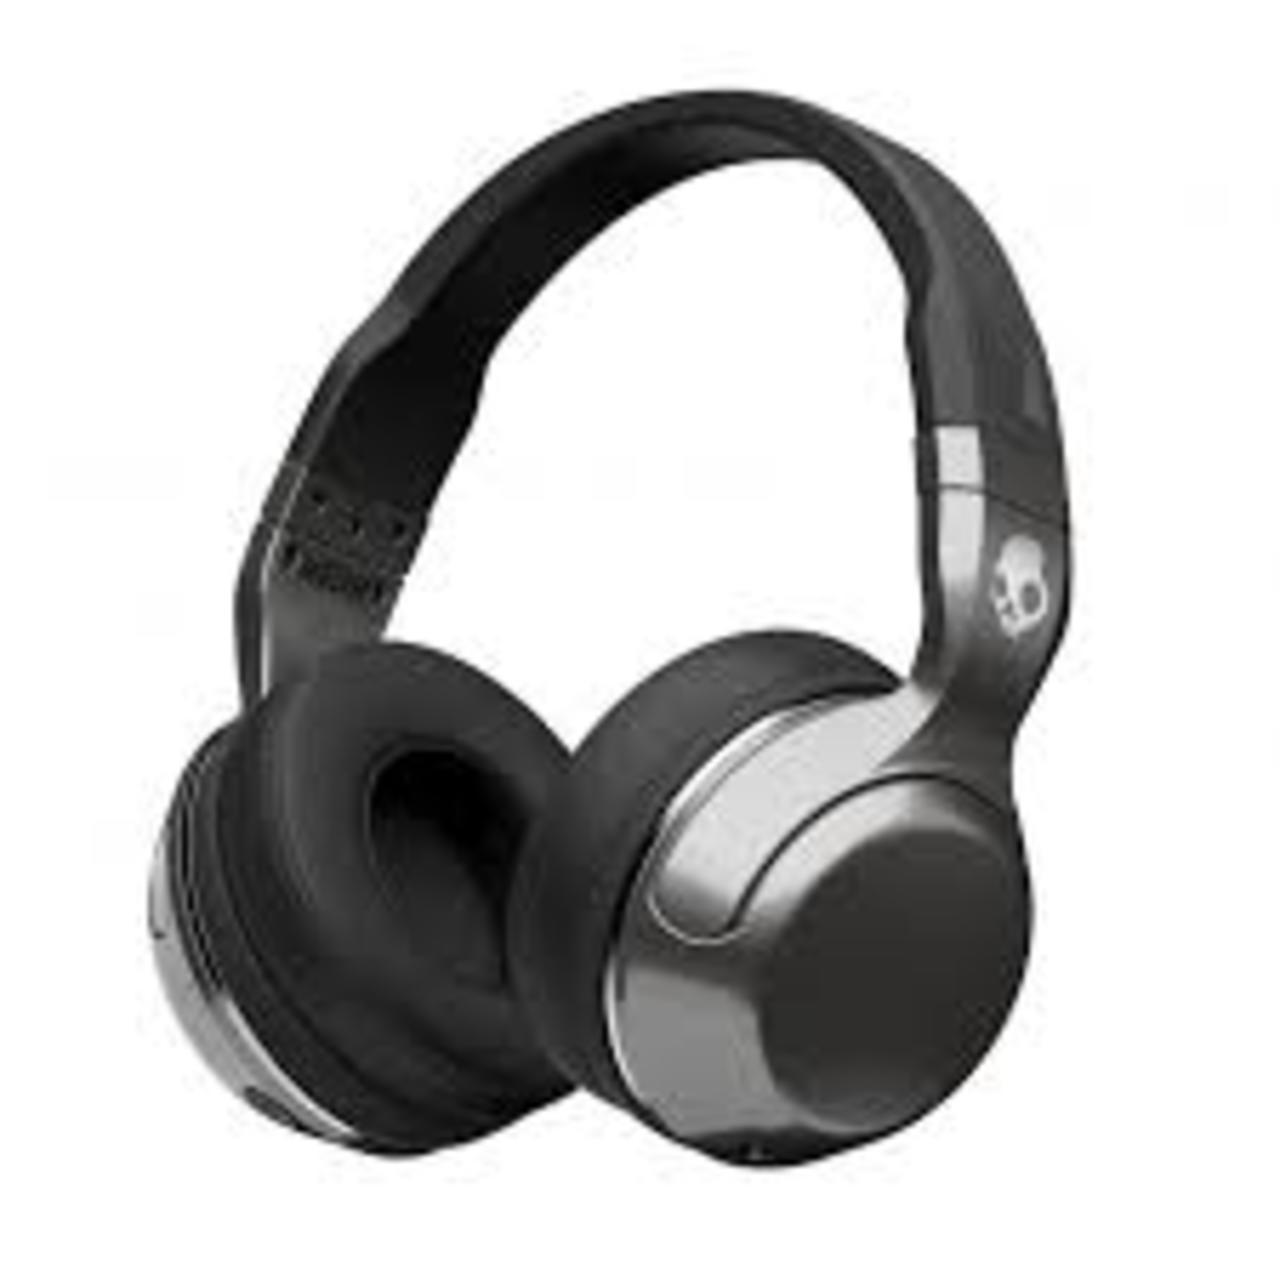 Hesh 2 Bluetooth silver-black-chrome